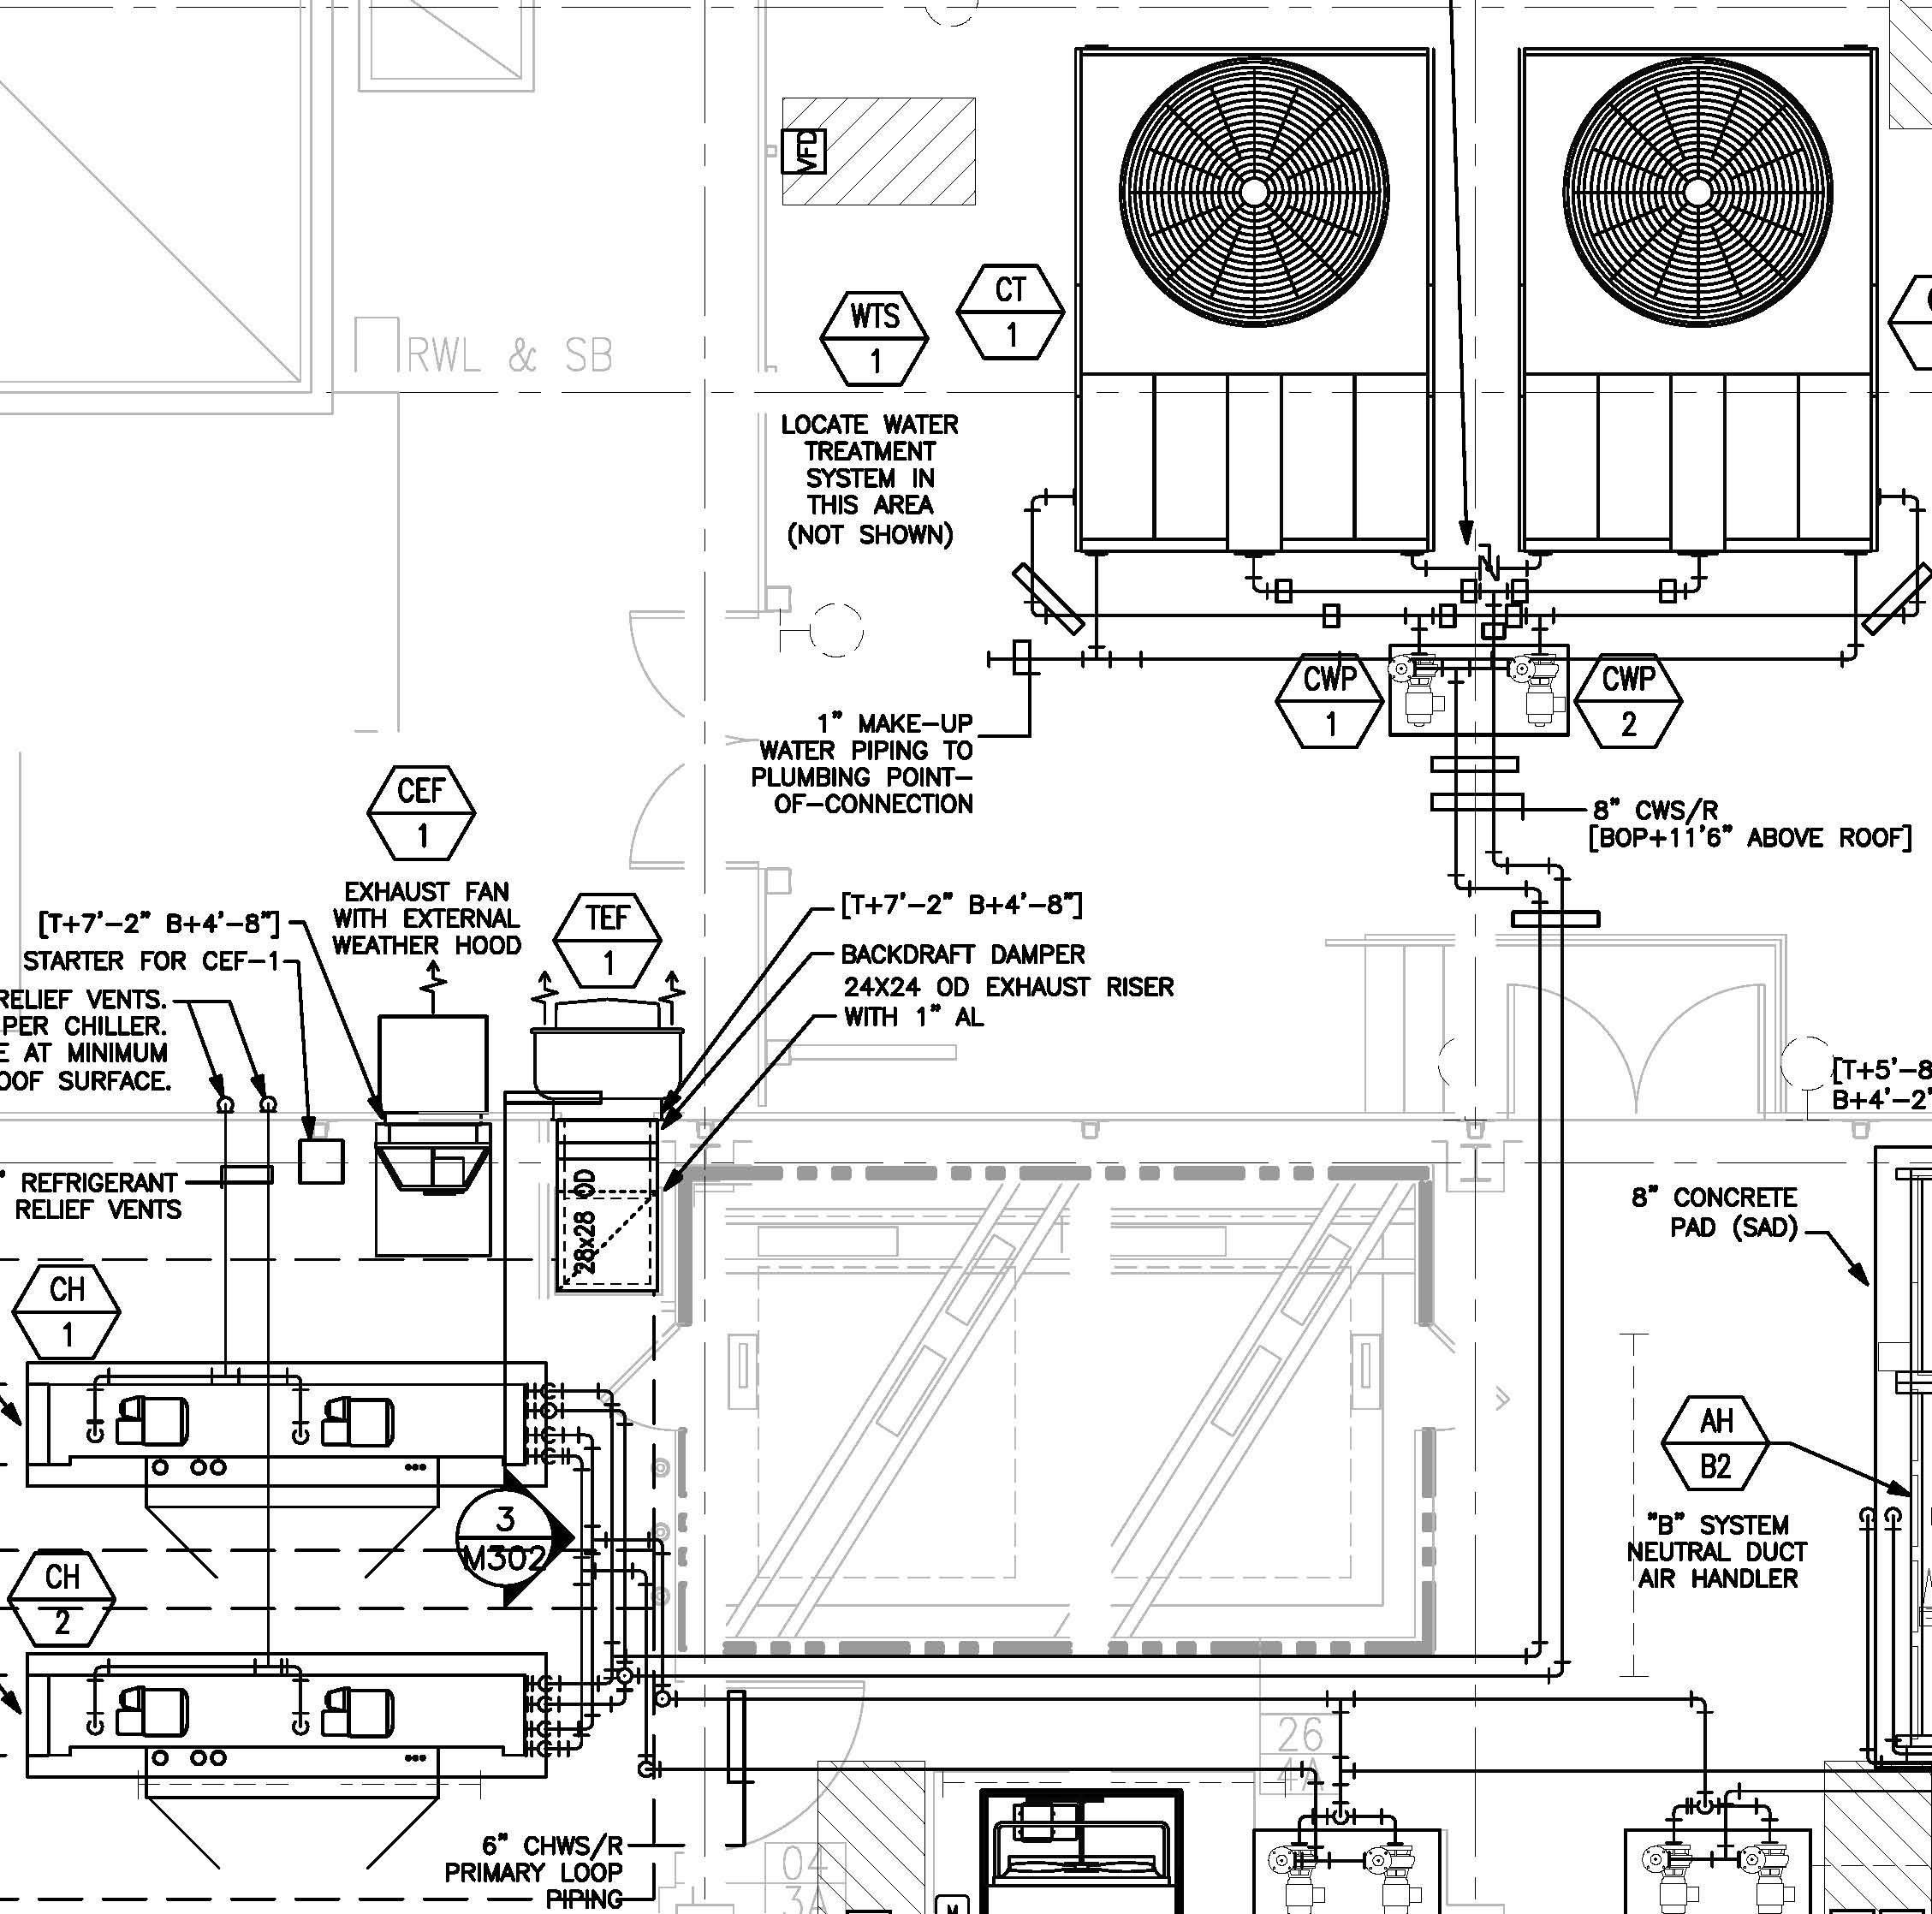 Diagram Of Car Electrical System 1989 Club Car Golf Cart Wiring Diagram Electrical Circuit Ez Go Of Diagram Of Car Electrical System